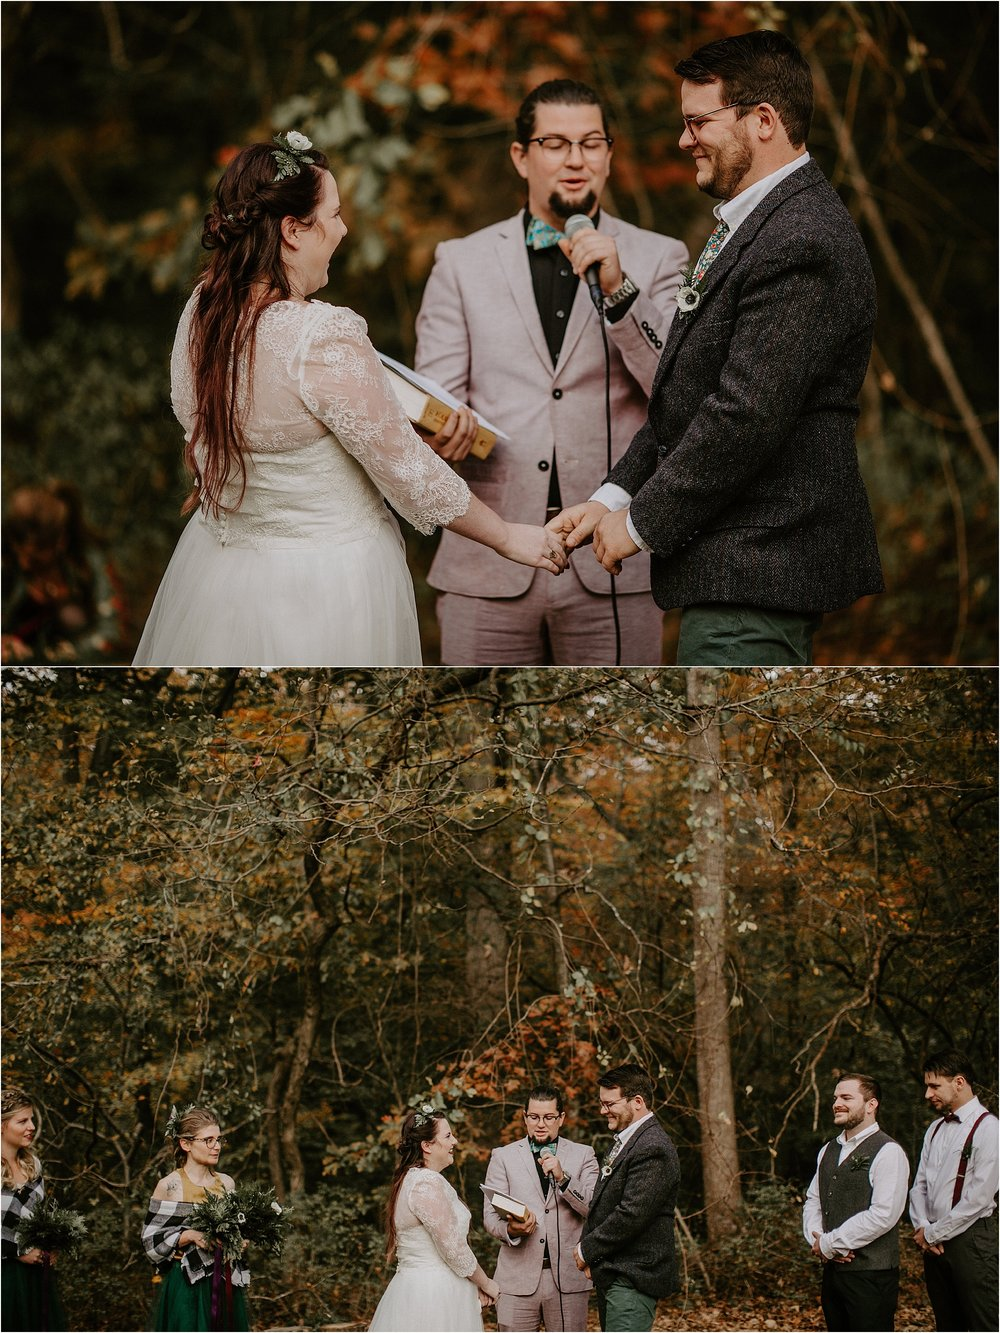 Sarah_Brookhart_Baltimore_Wedding_Photographer_0042.jpg